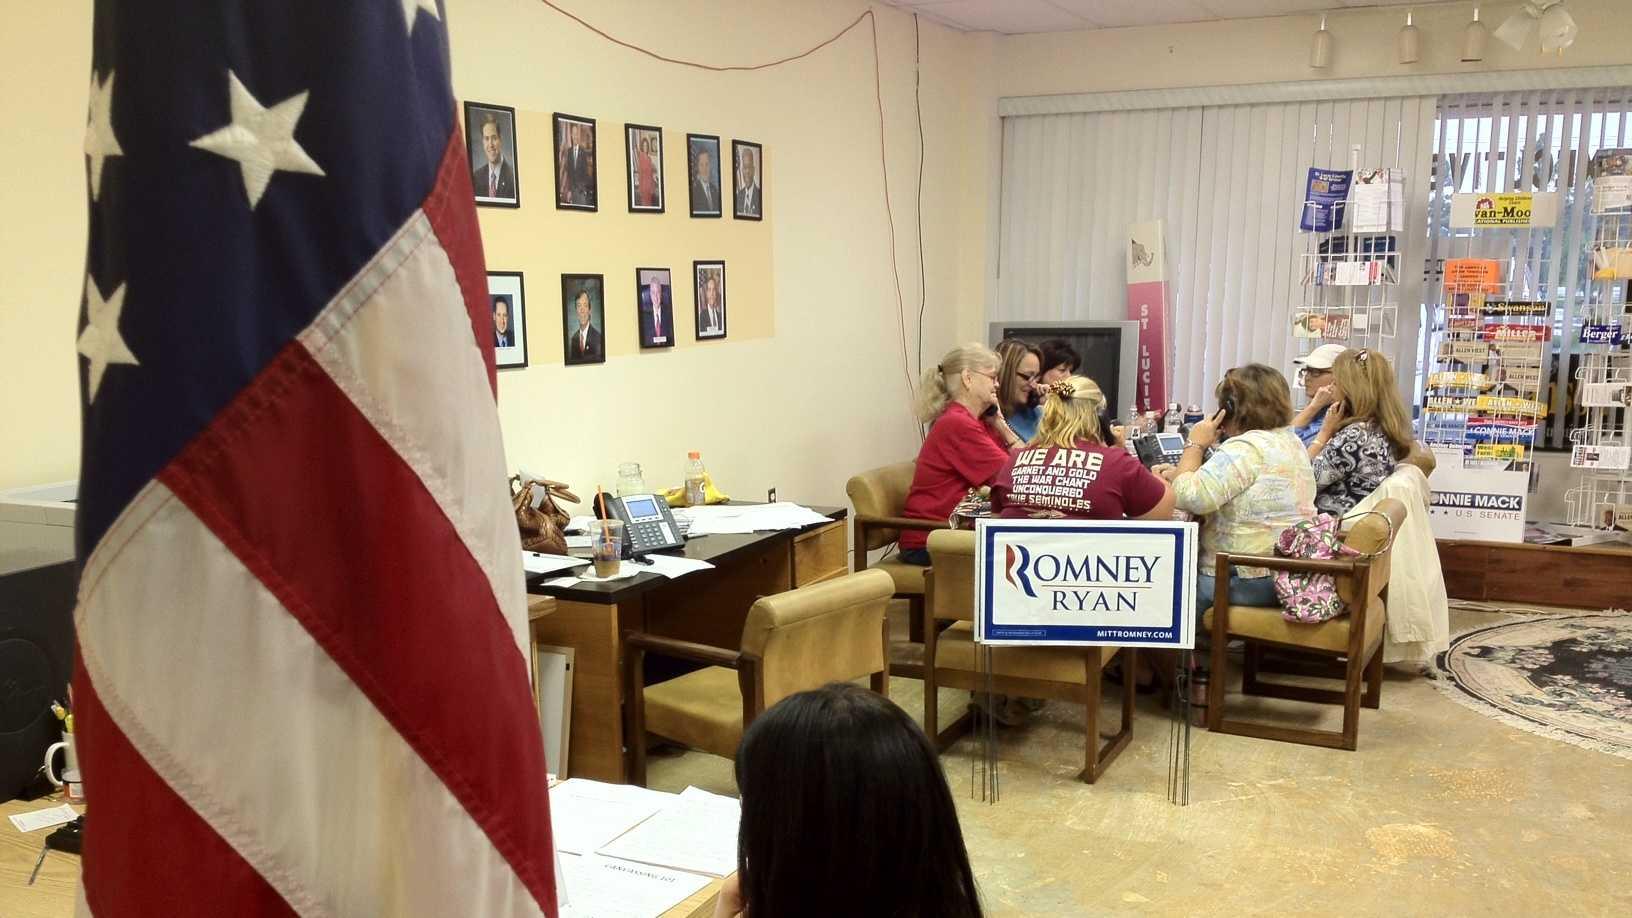 Romney to speak in Port St. Lucie